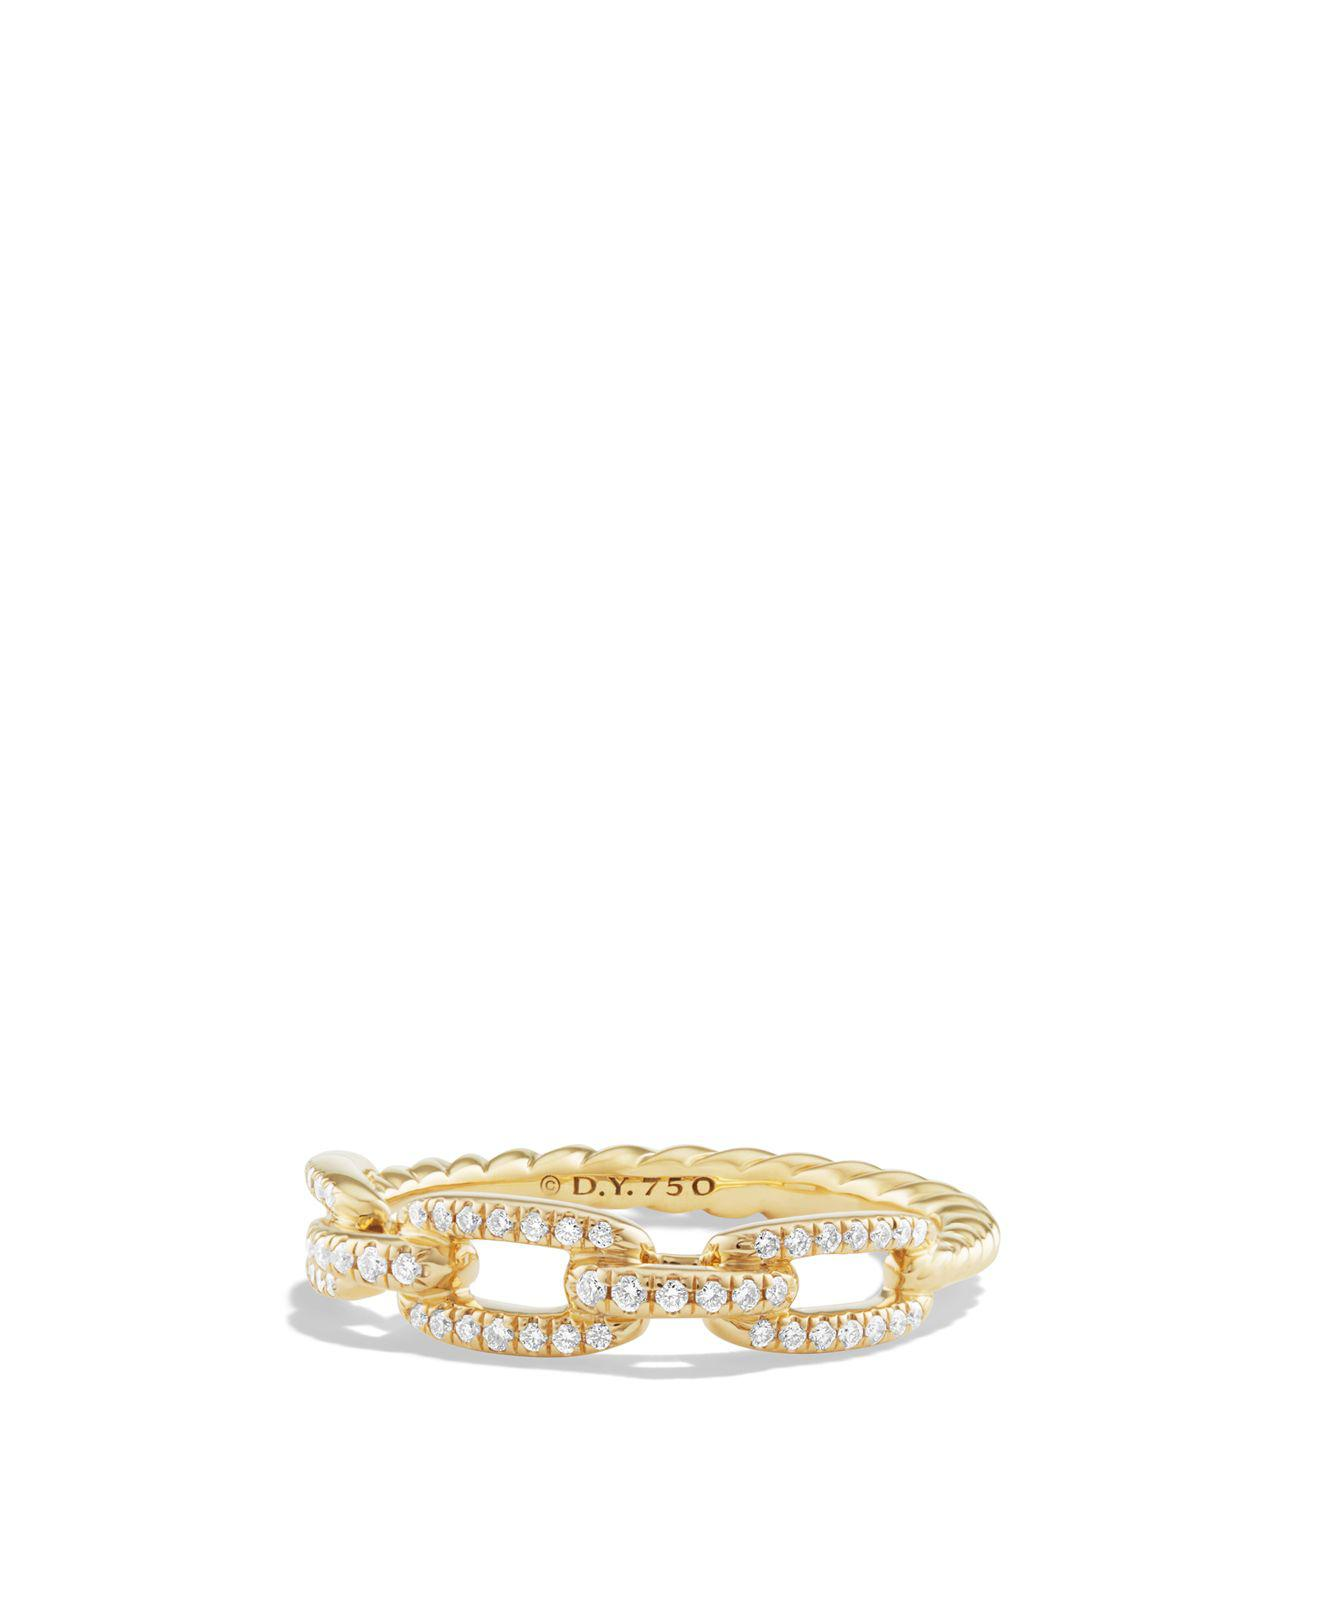 David Yurman 18kt yellow gold Stax single row pavé diamond chain link ring - Metallic xWrRwMxN